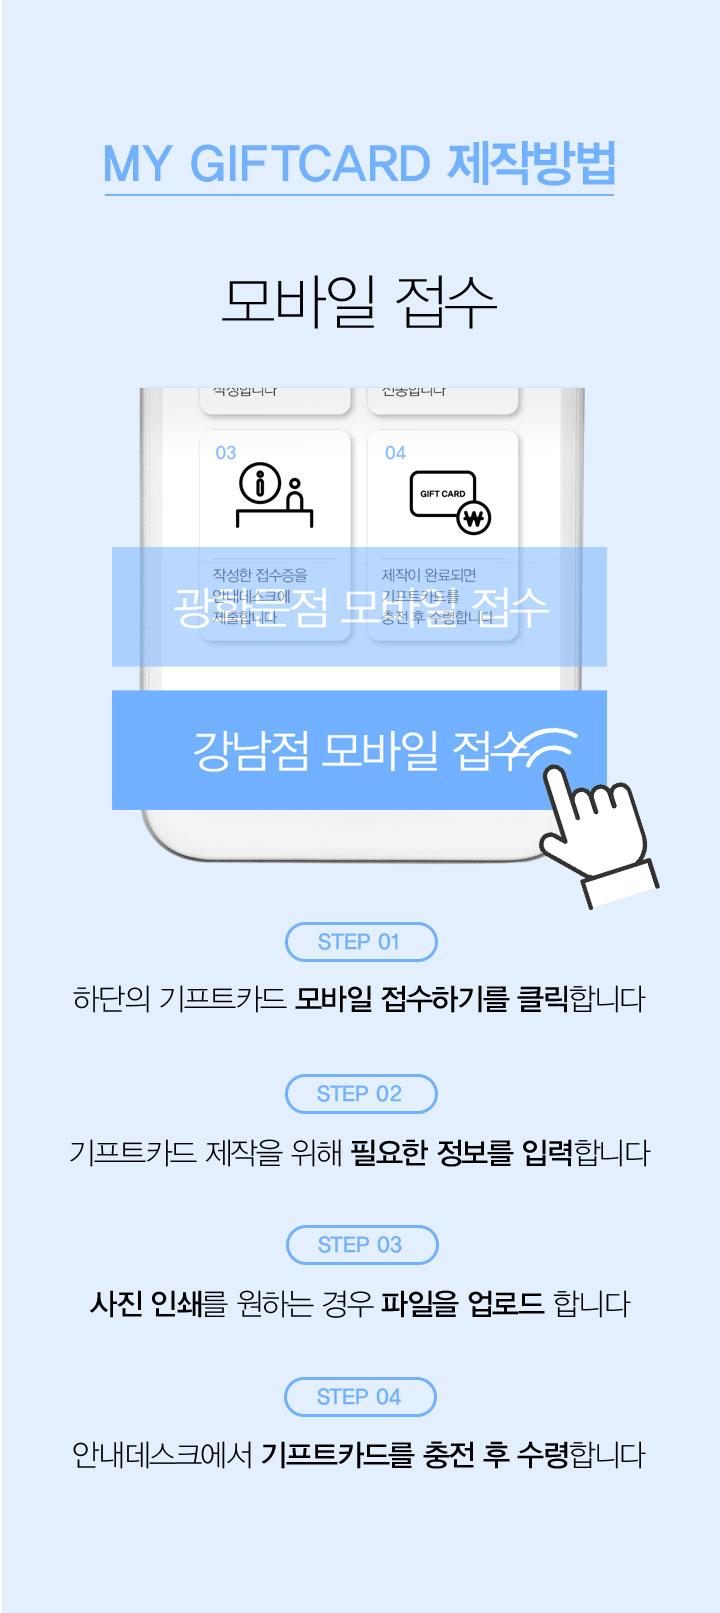 MY GIFTCARD 제작방법: 모바일접수